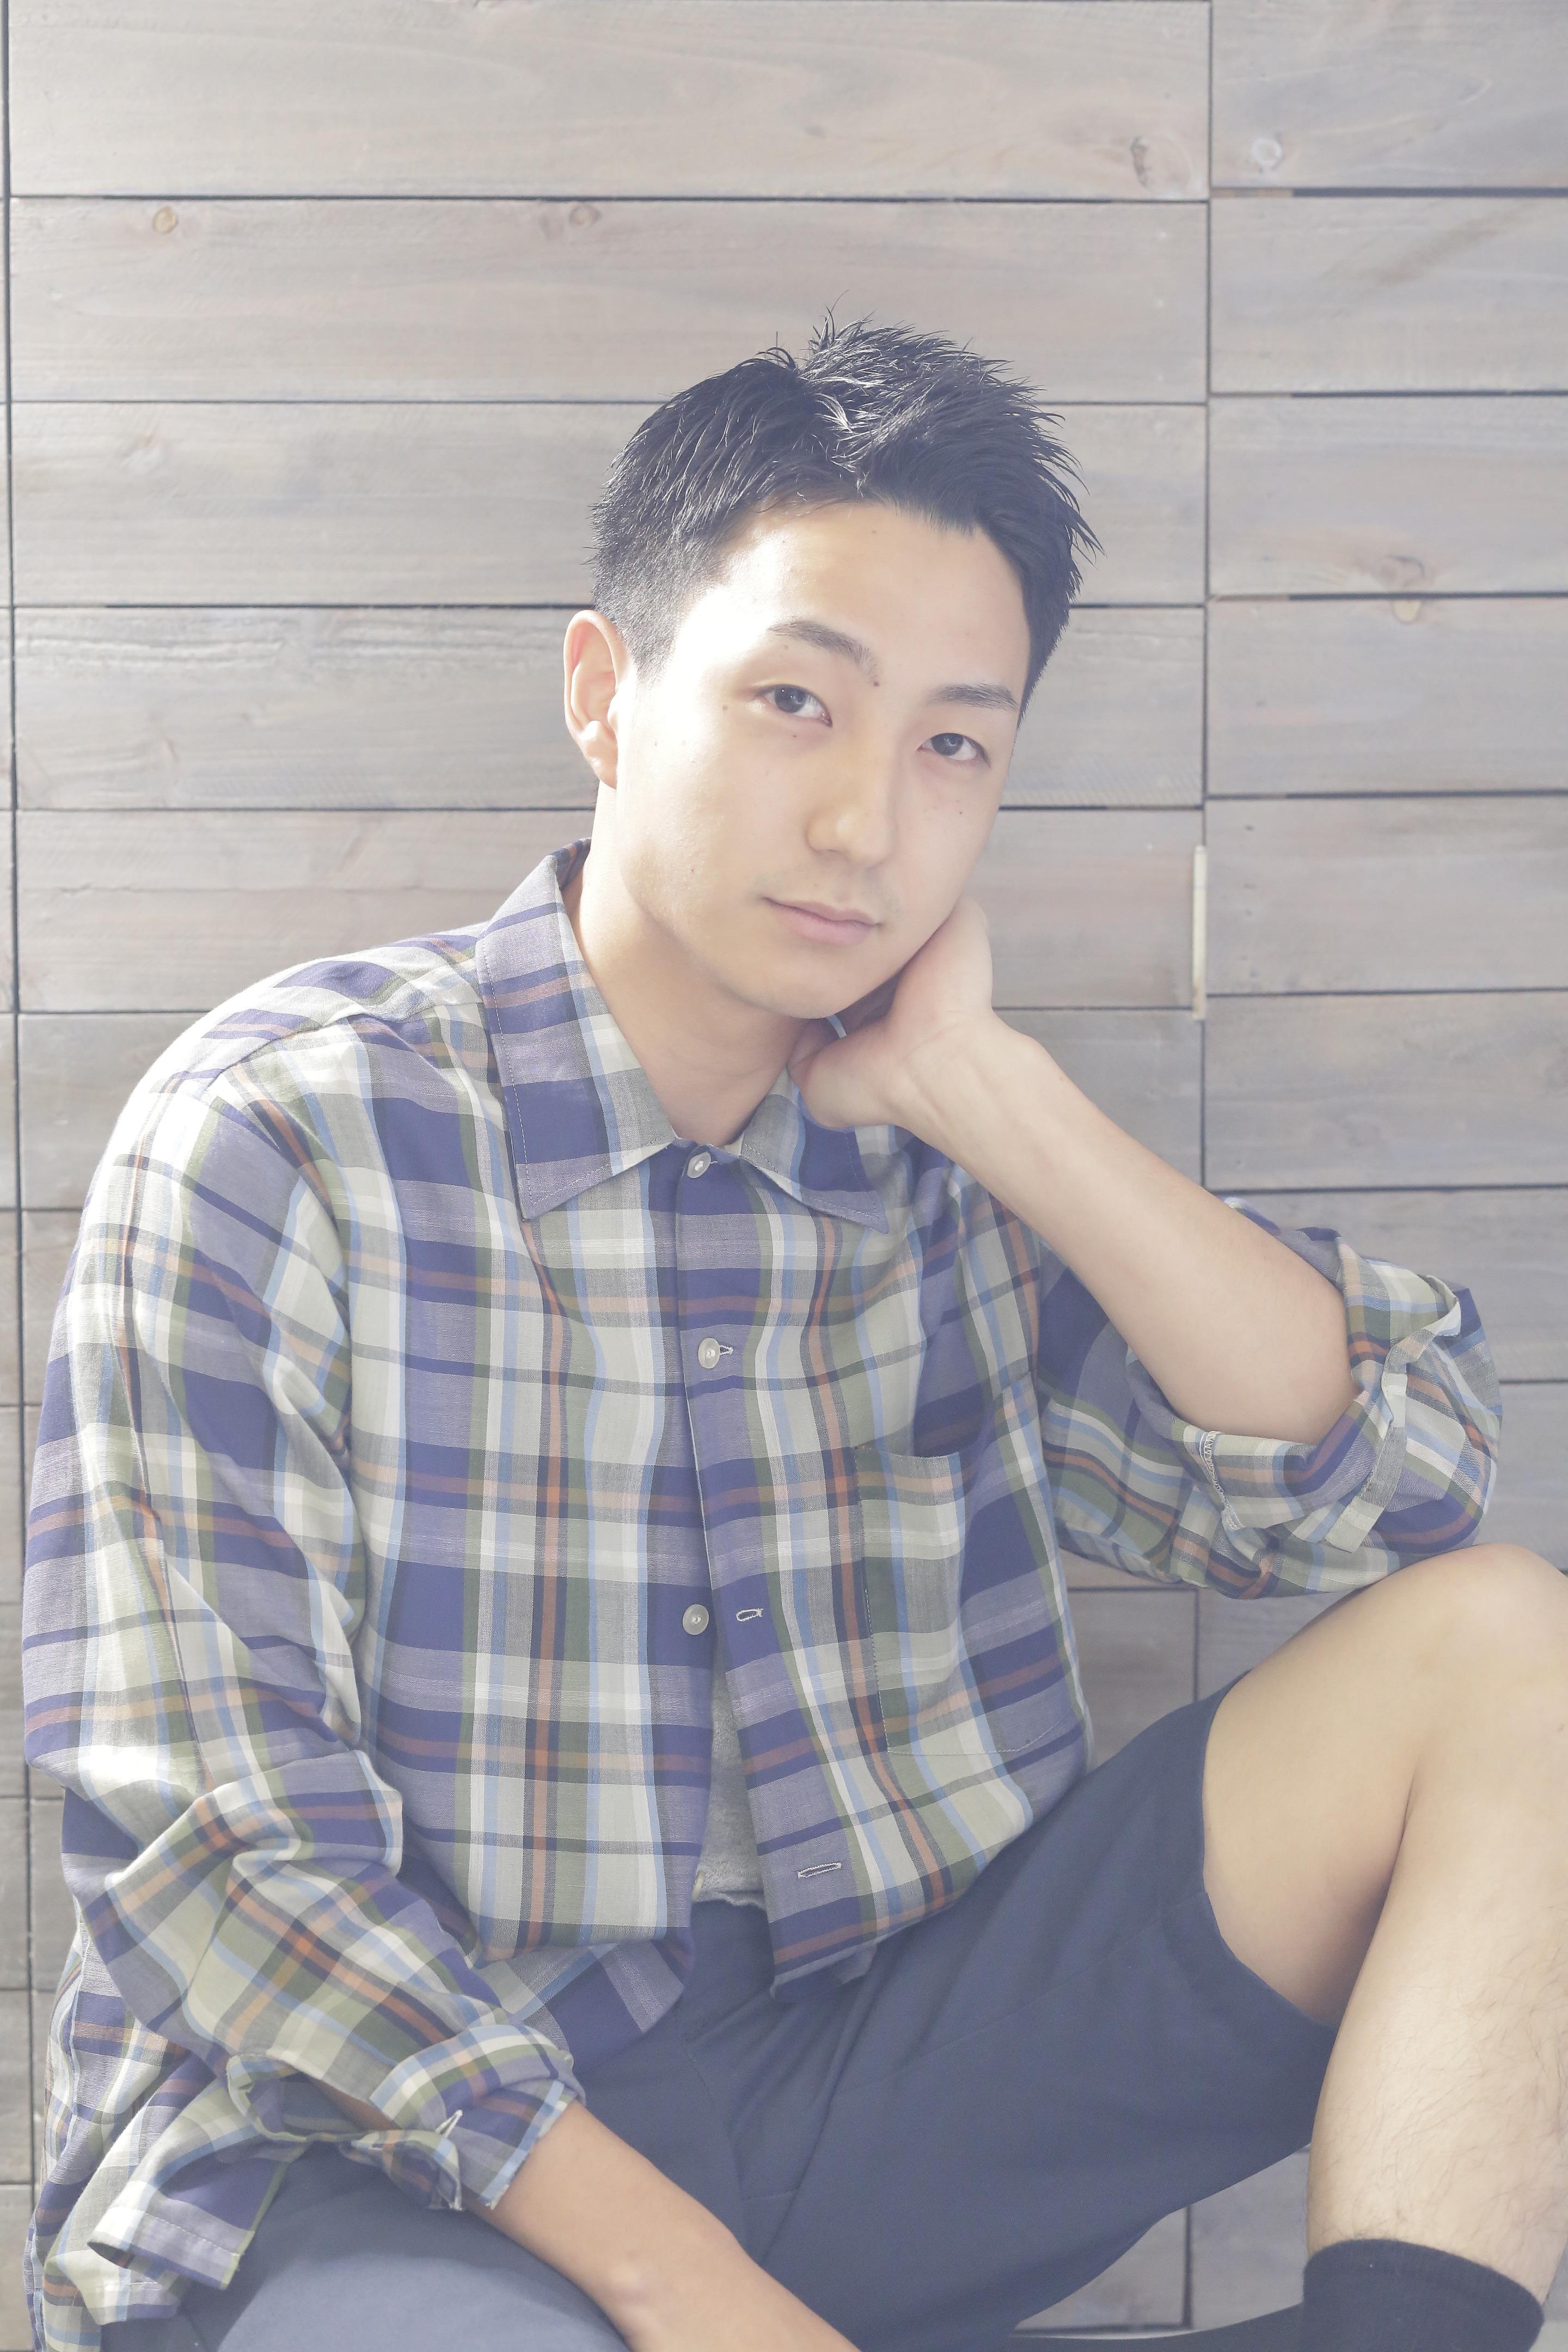 http://www.savian.jp/asset/1b1b78047c9abb39dc960ce88ede46ef7d44ea96.JPG